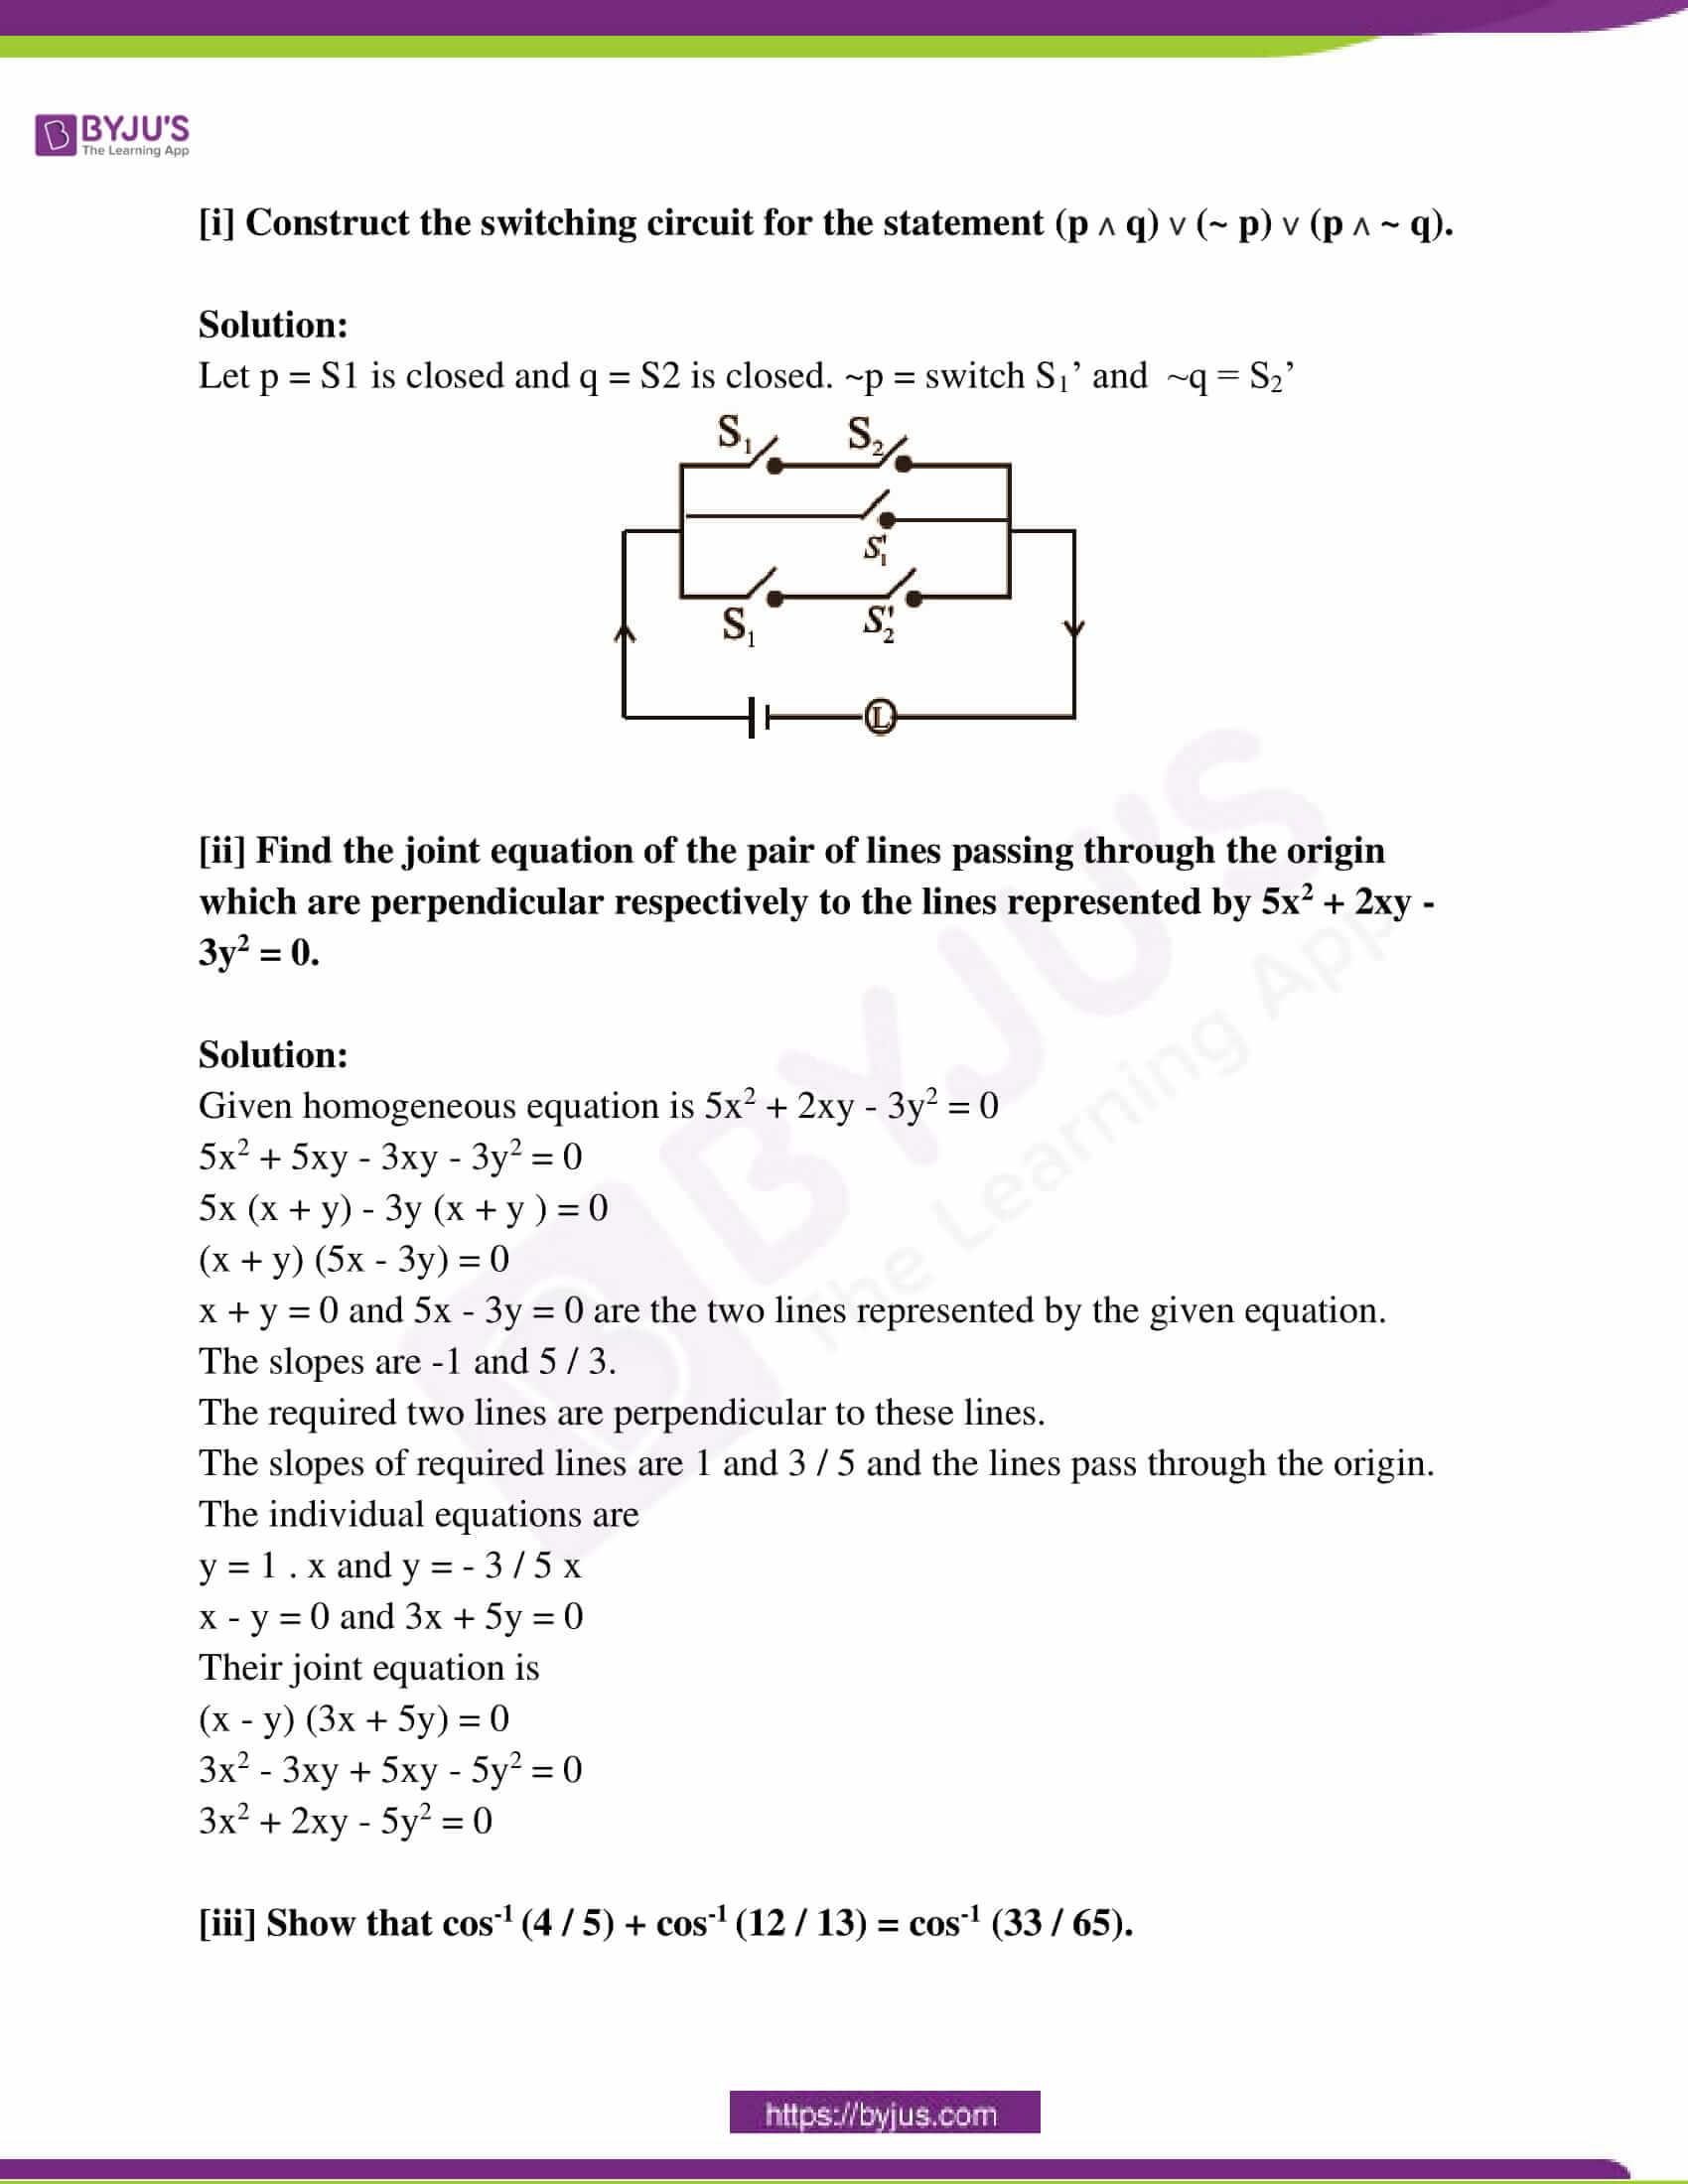 maharashtra class 12 exam question paper solutions march 2017 11